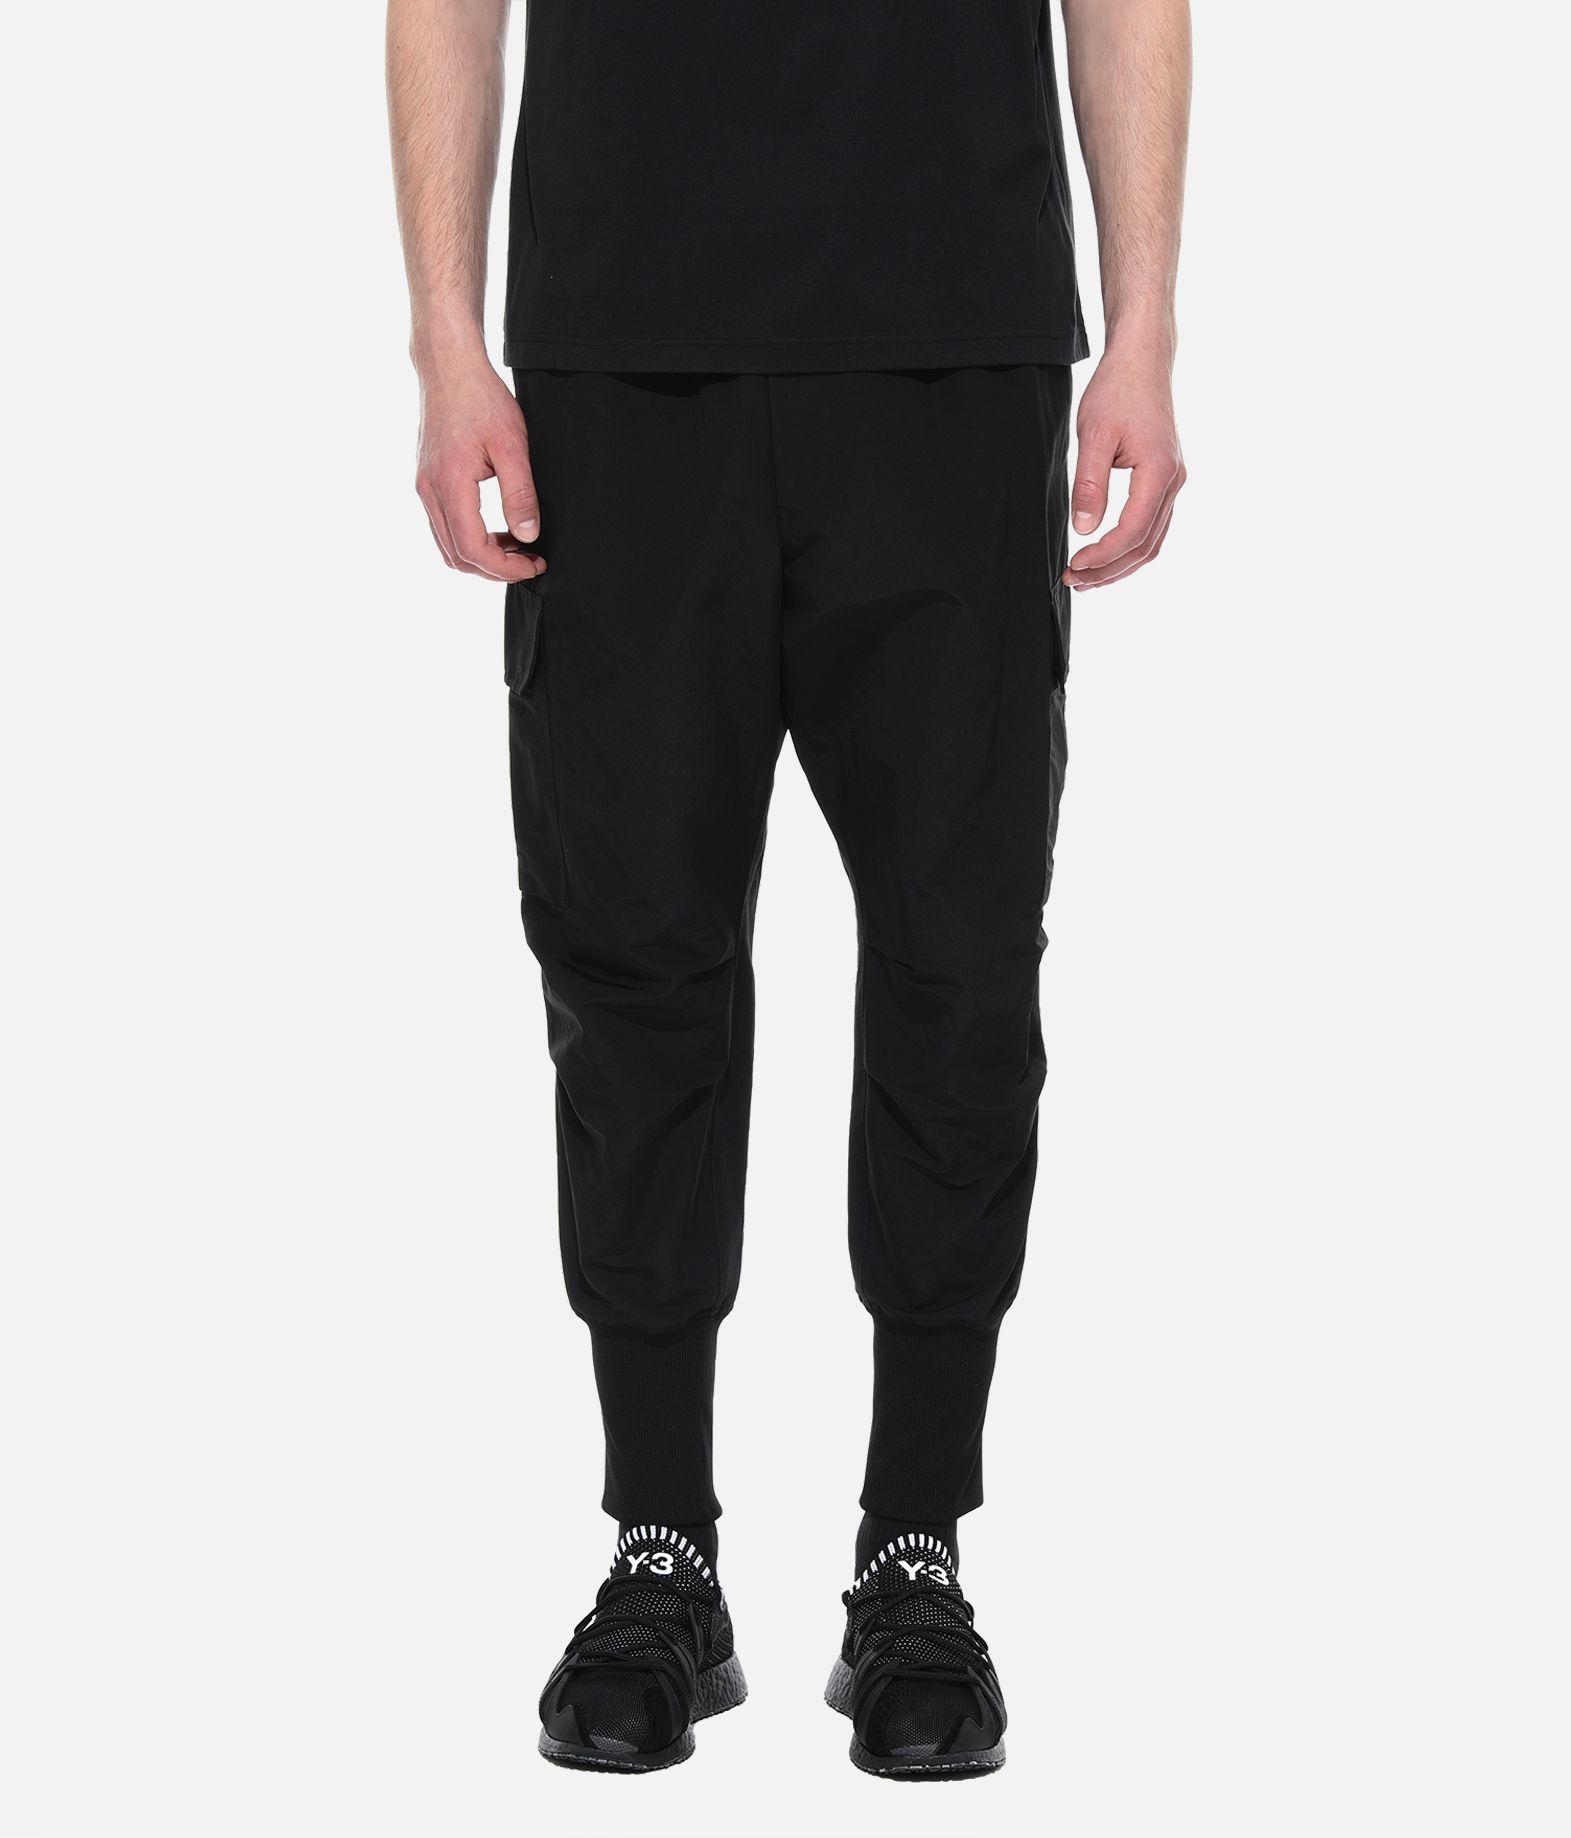 Y-3 Y-3 Nylon Cargo Pants パンツ メンズ r